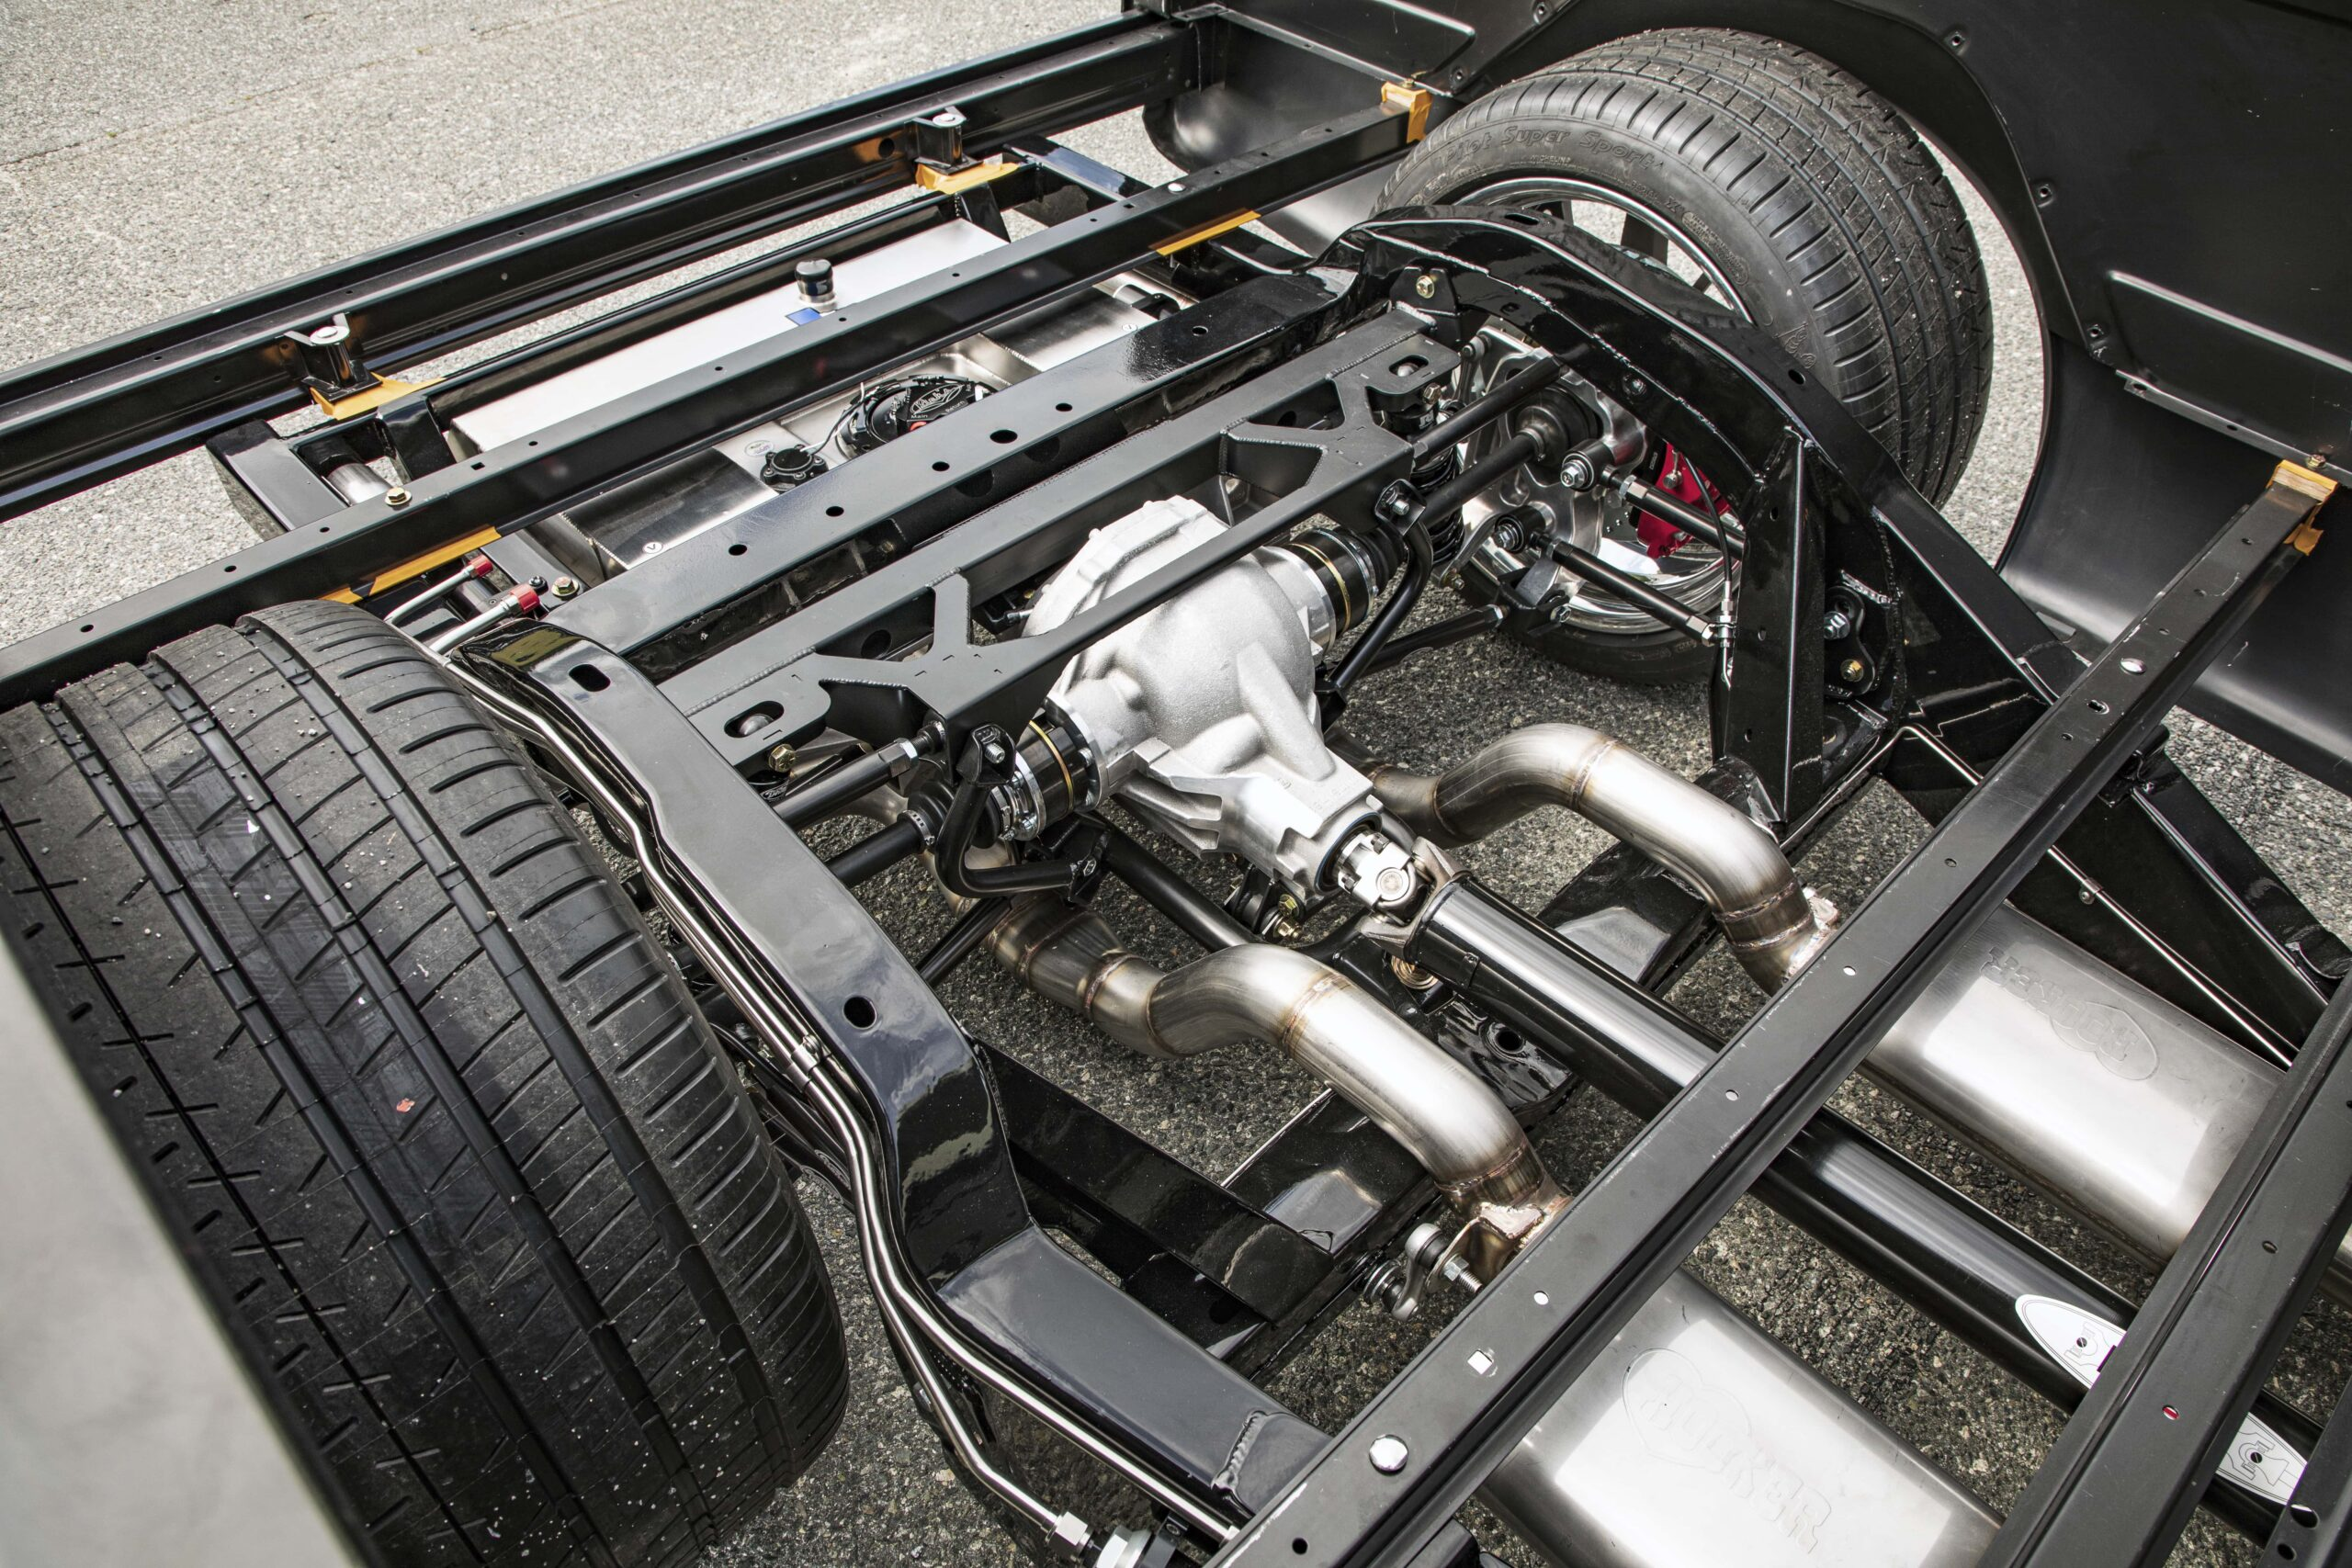 Detroit Speed 1967 Chevy C10 Build